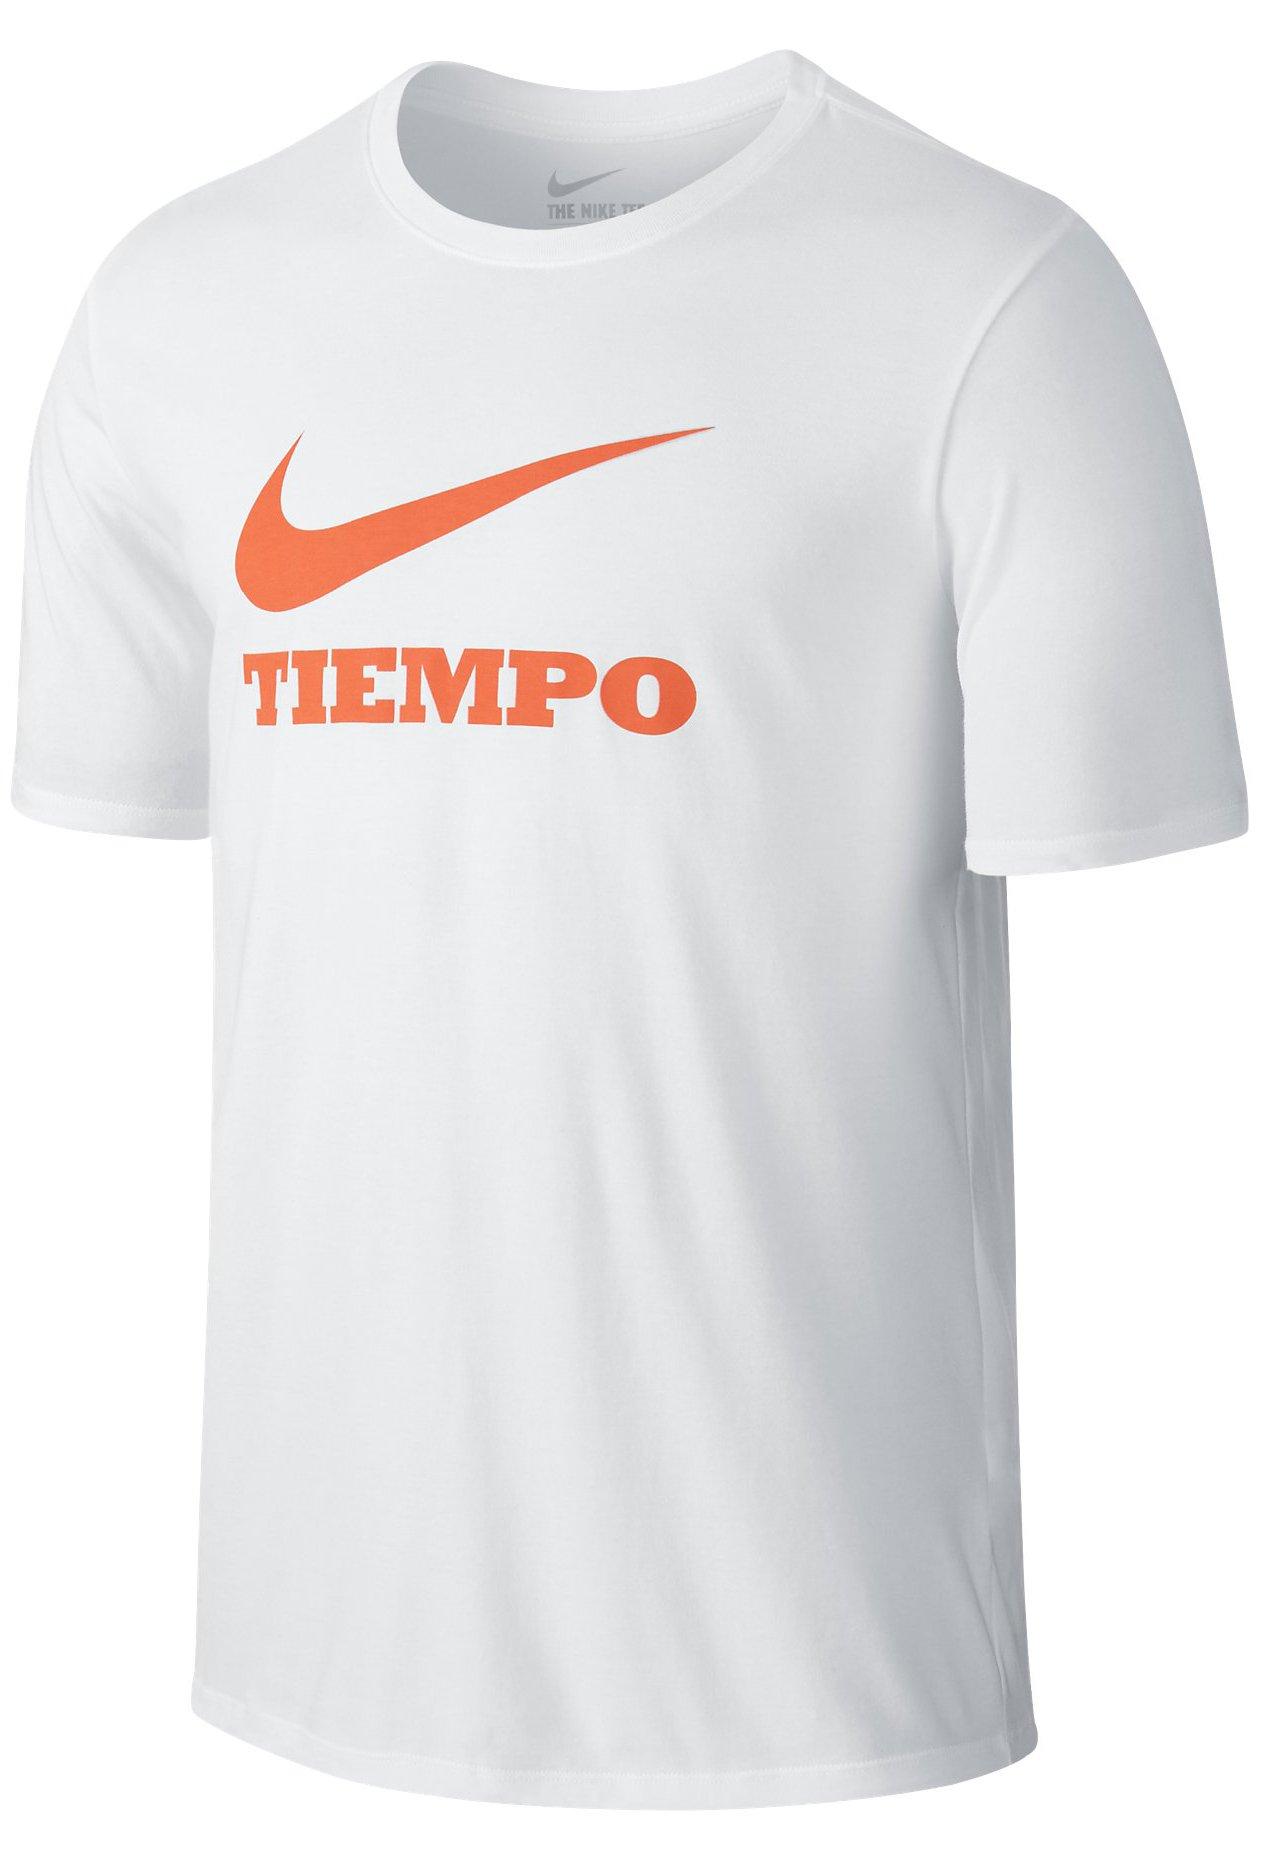 Triko Nike TIEMPO SWOOSH TEE